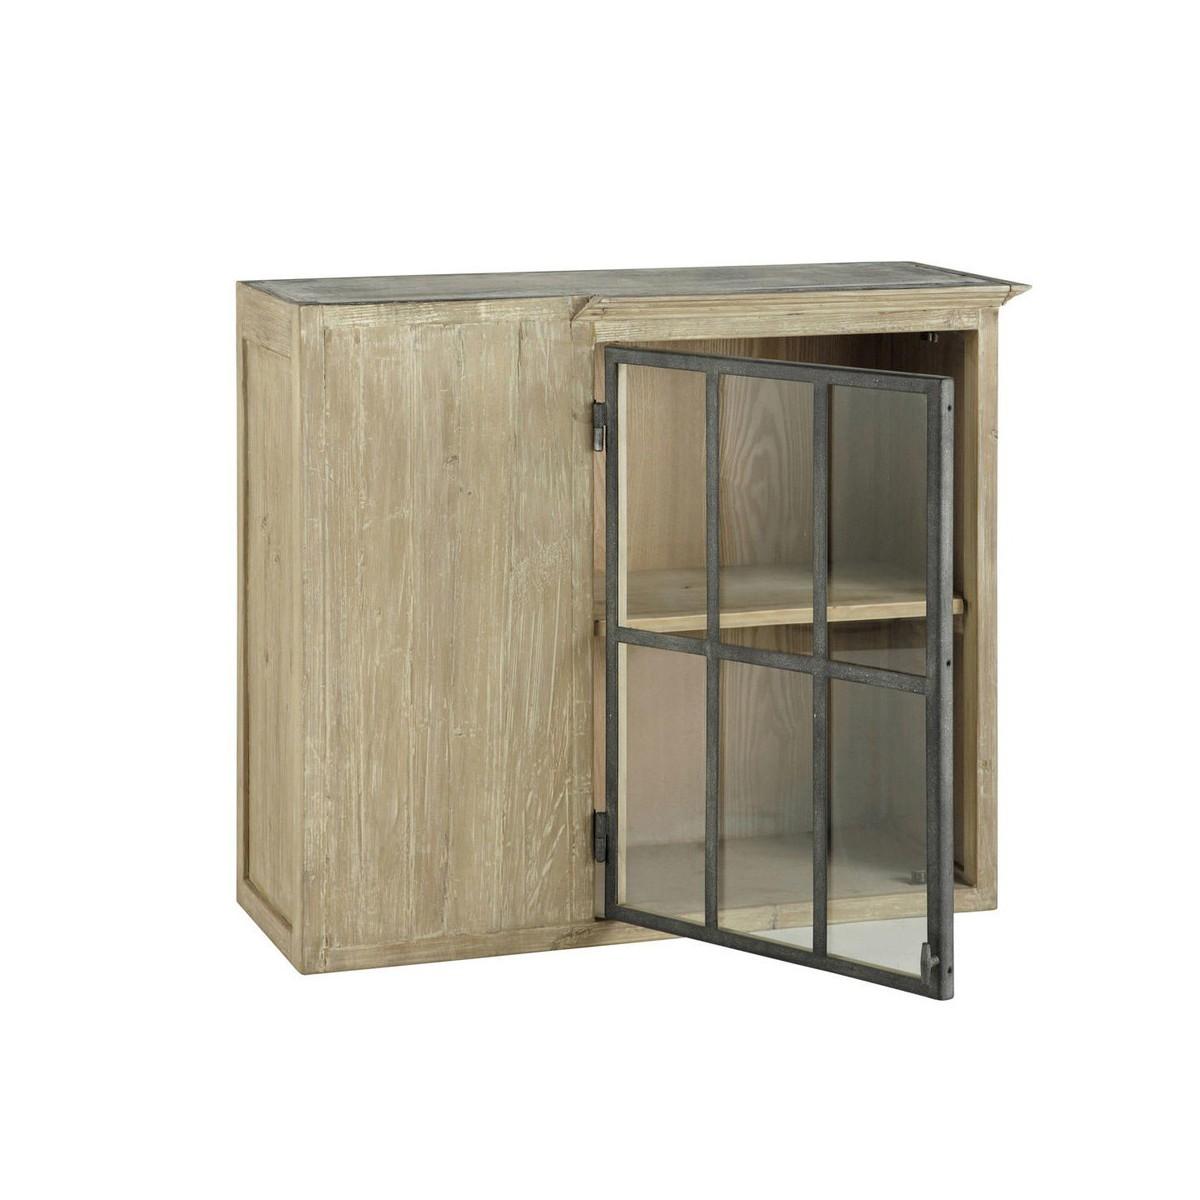 latest free superior meuble haut vitre cuisine with meuble vitr cuisine with meuble haut vitr. Black Bedroom Furniture Sets. Home Design Ideas